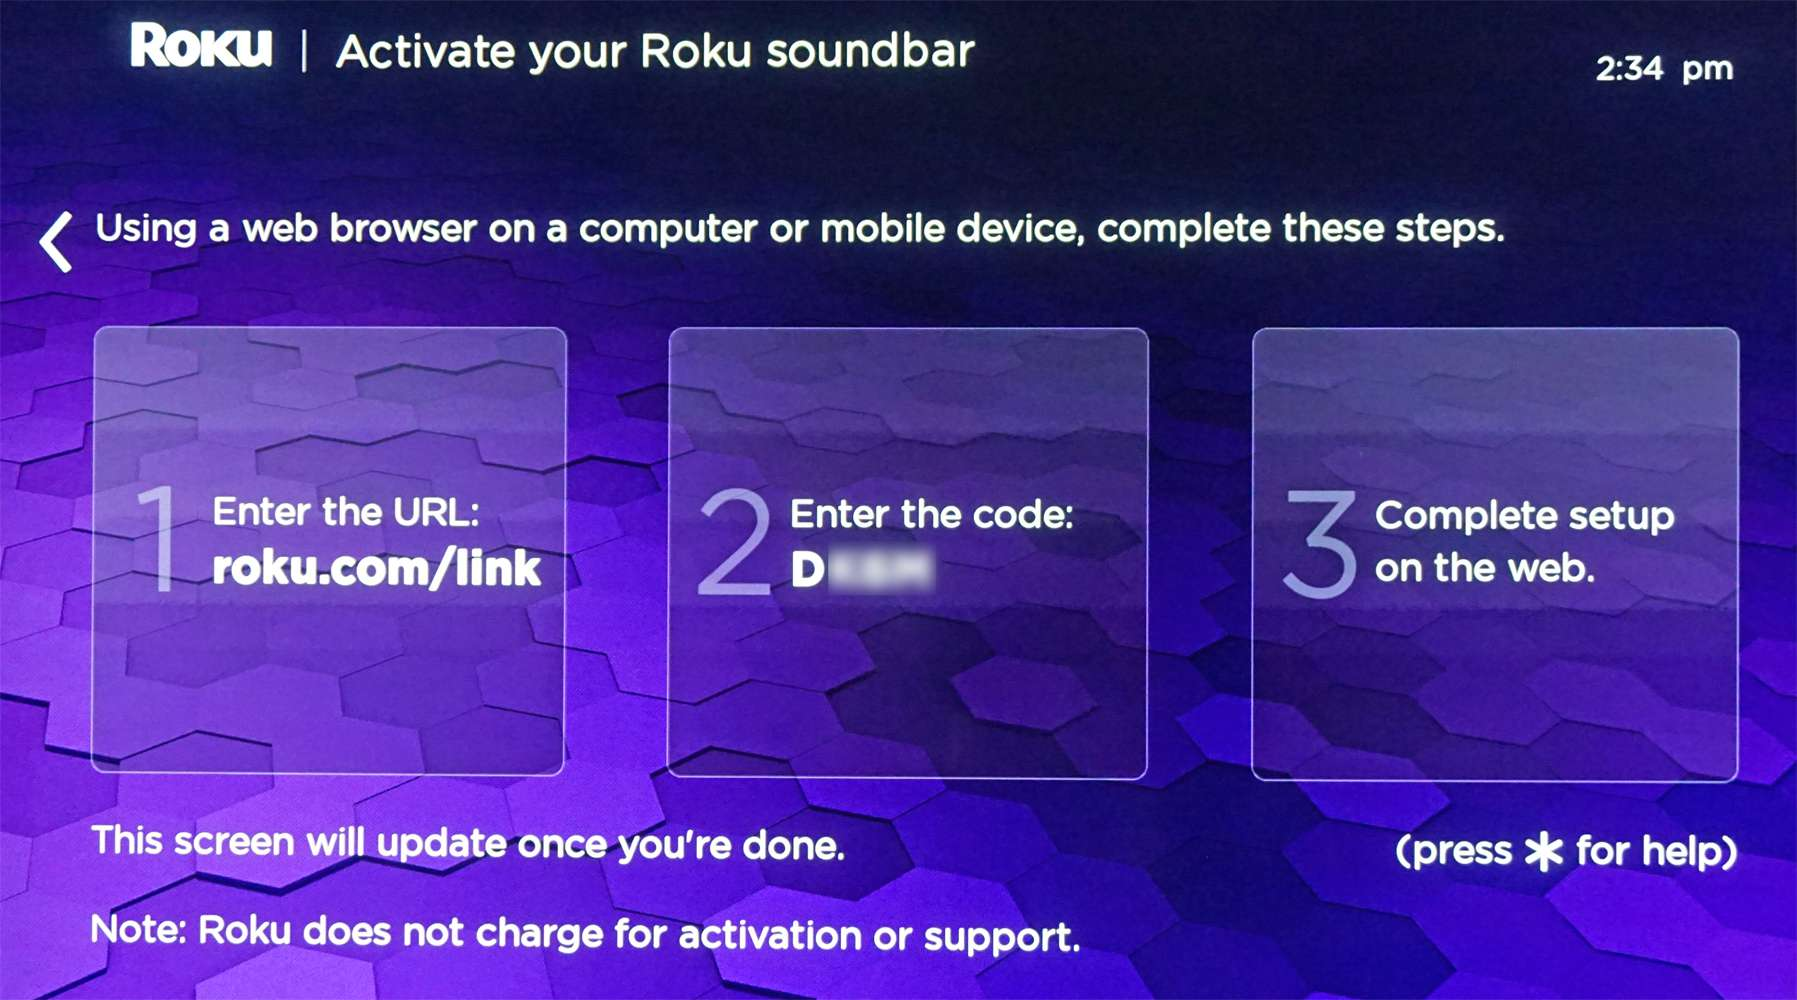 Roku Soundbar – Link Code/Complete Setup on Web